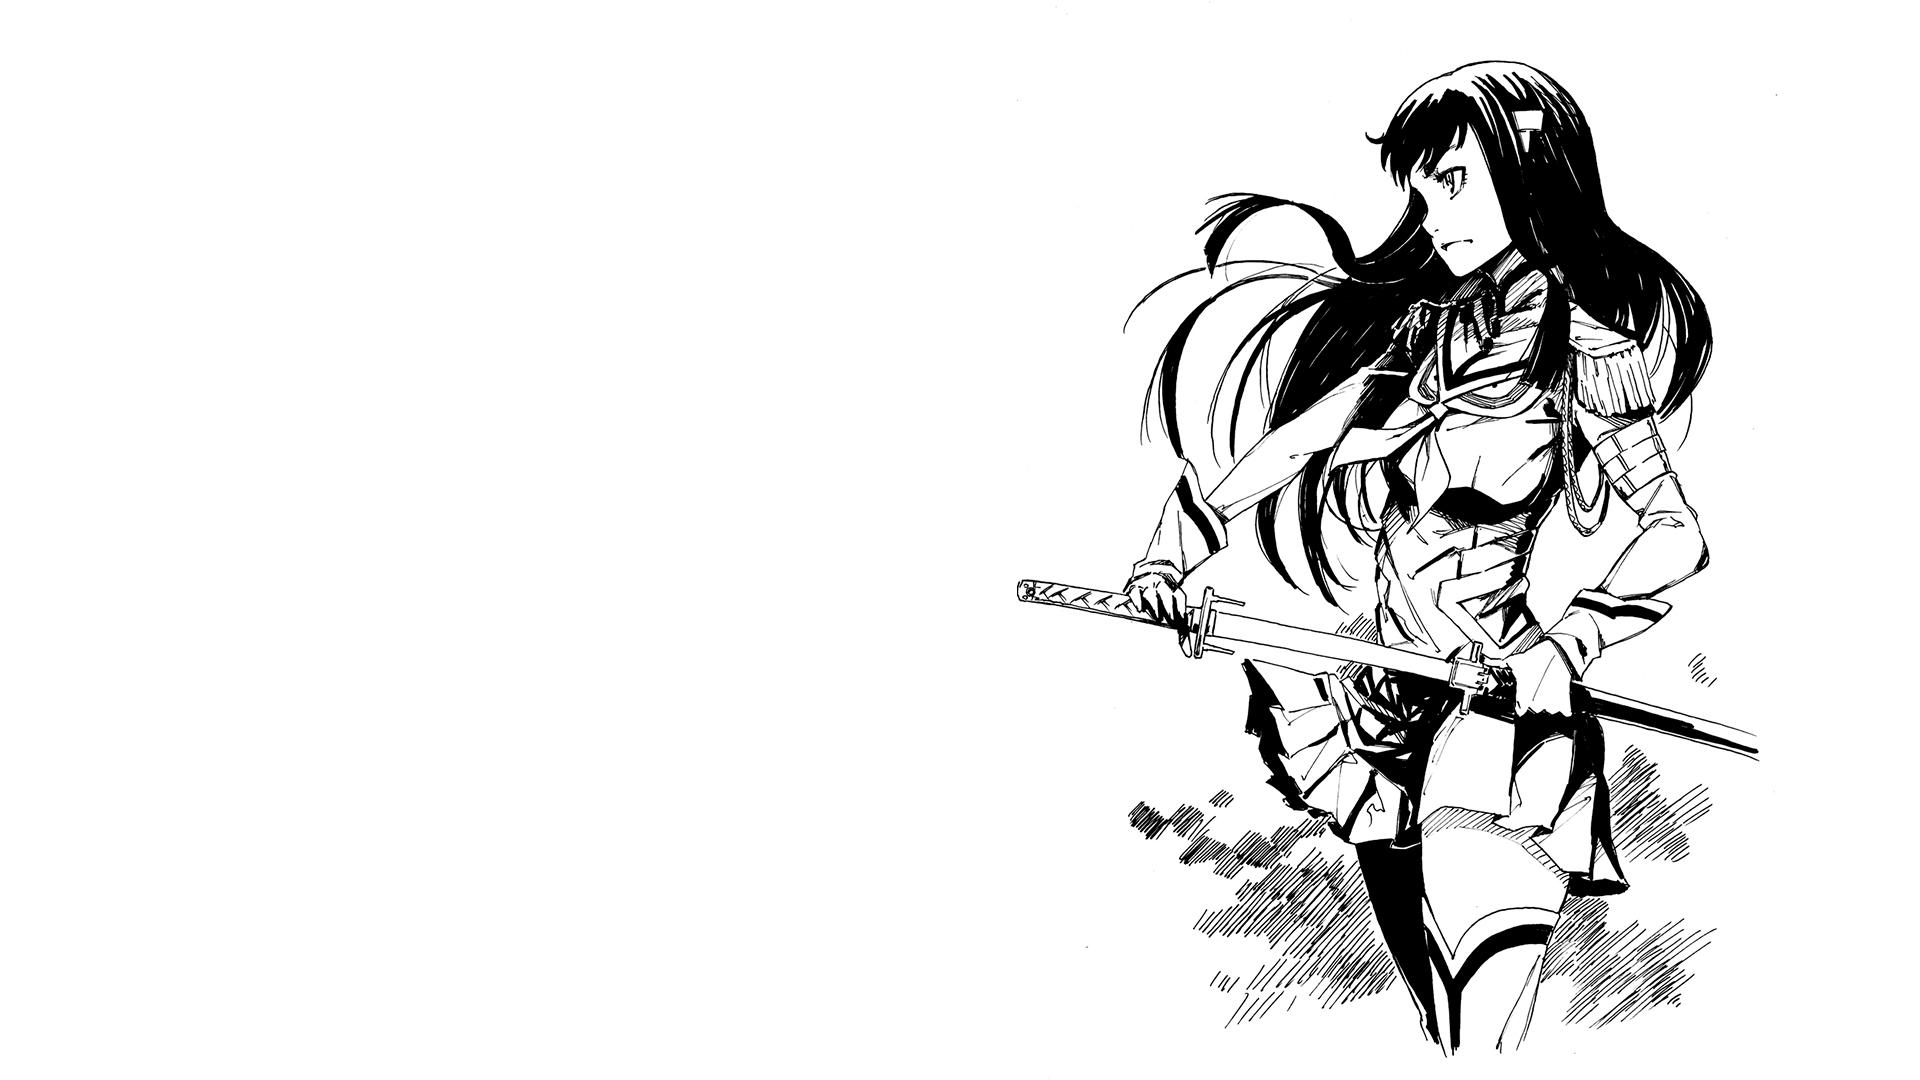 Anime Kill La Kill Hd Wallpaper Background Image 1920x1080